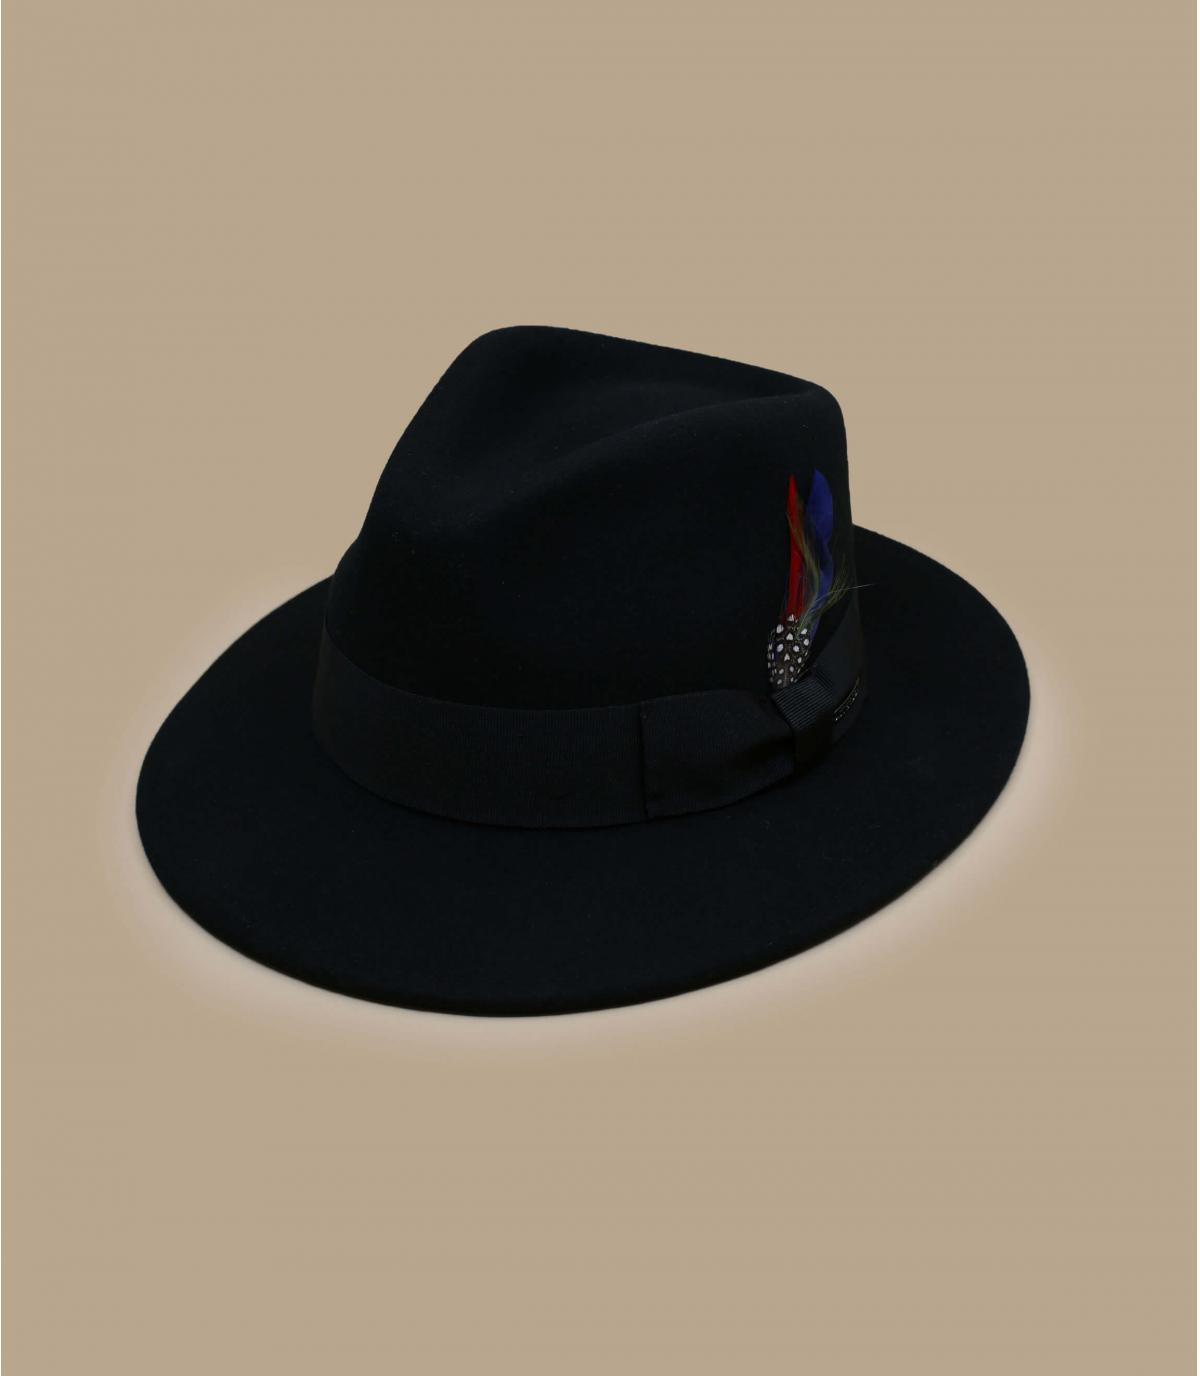 Détails Traveller Tacoma Woolfelt Cashmere black - image 2